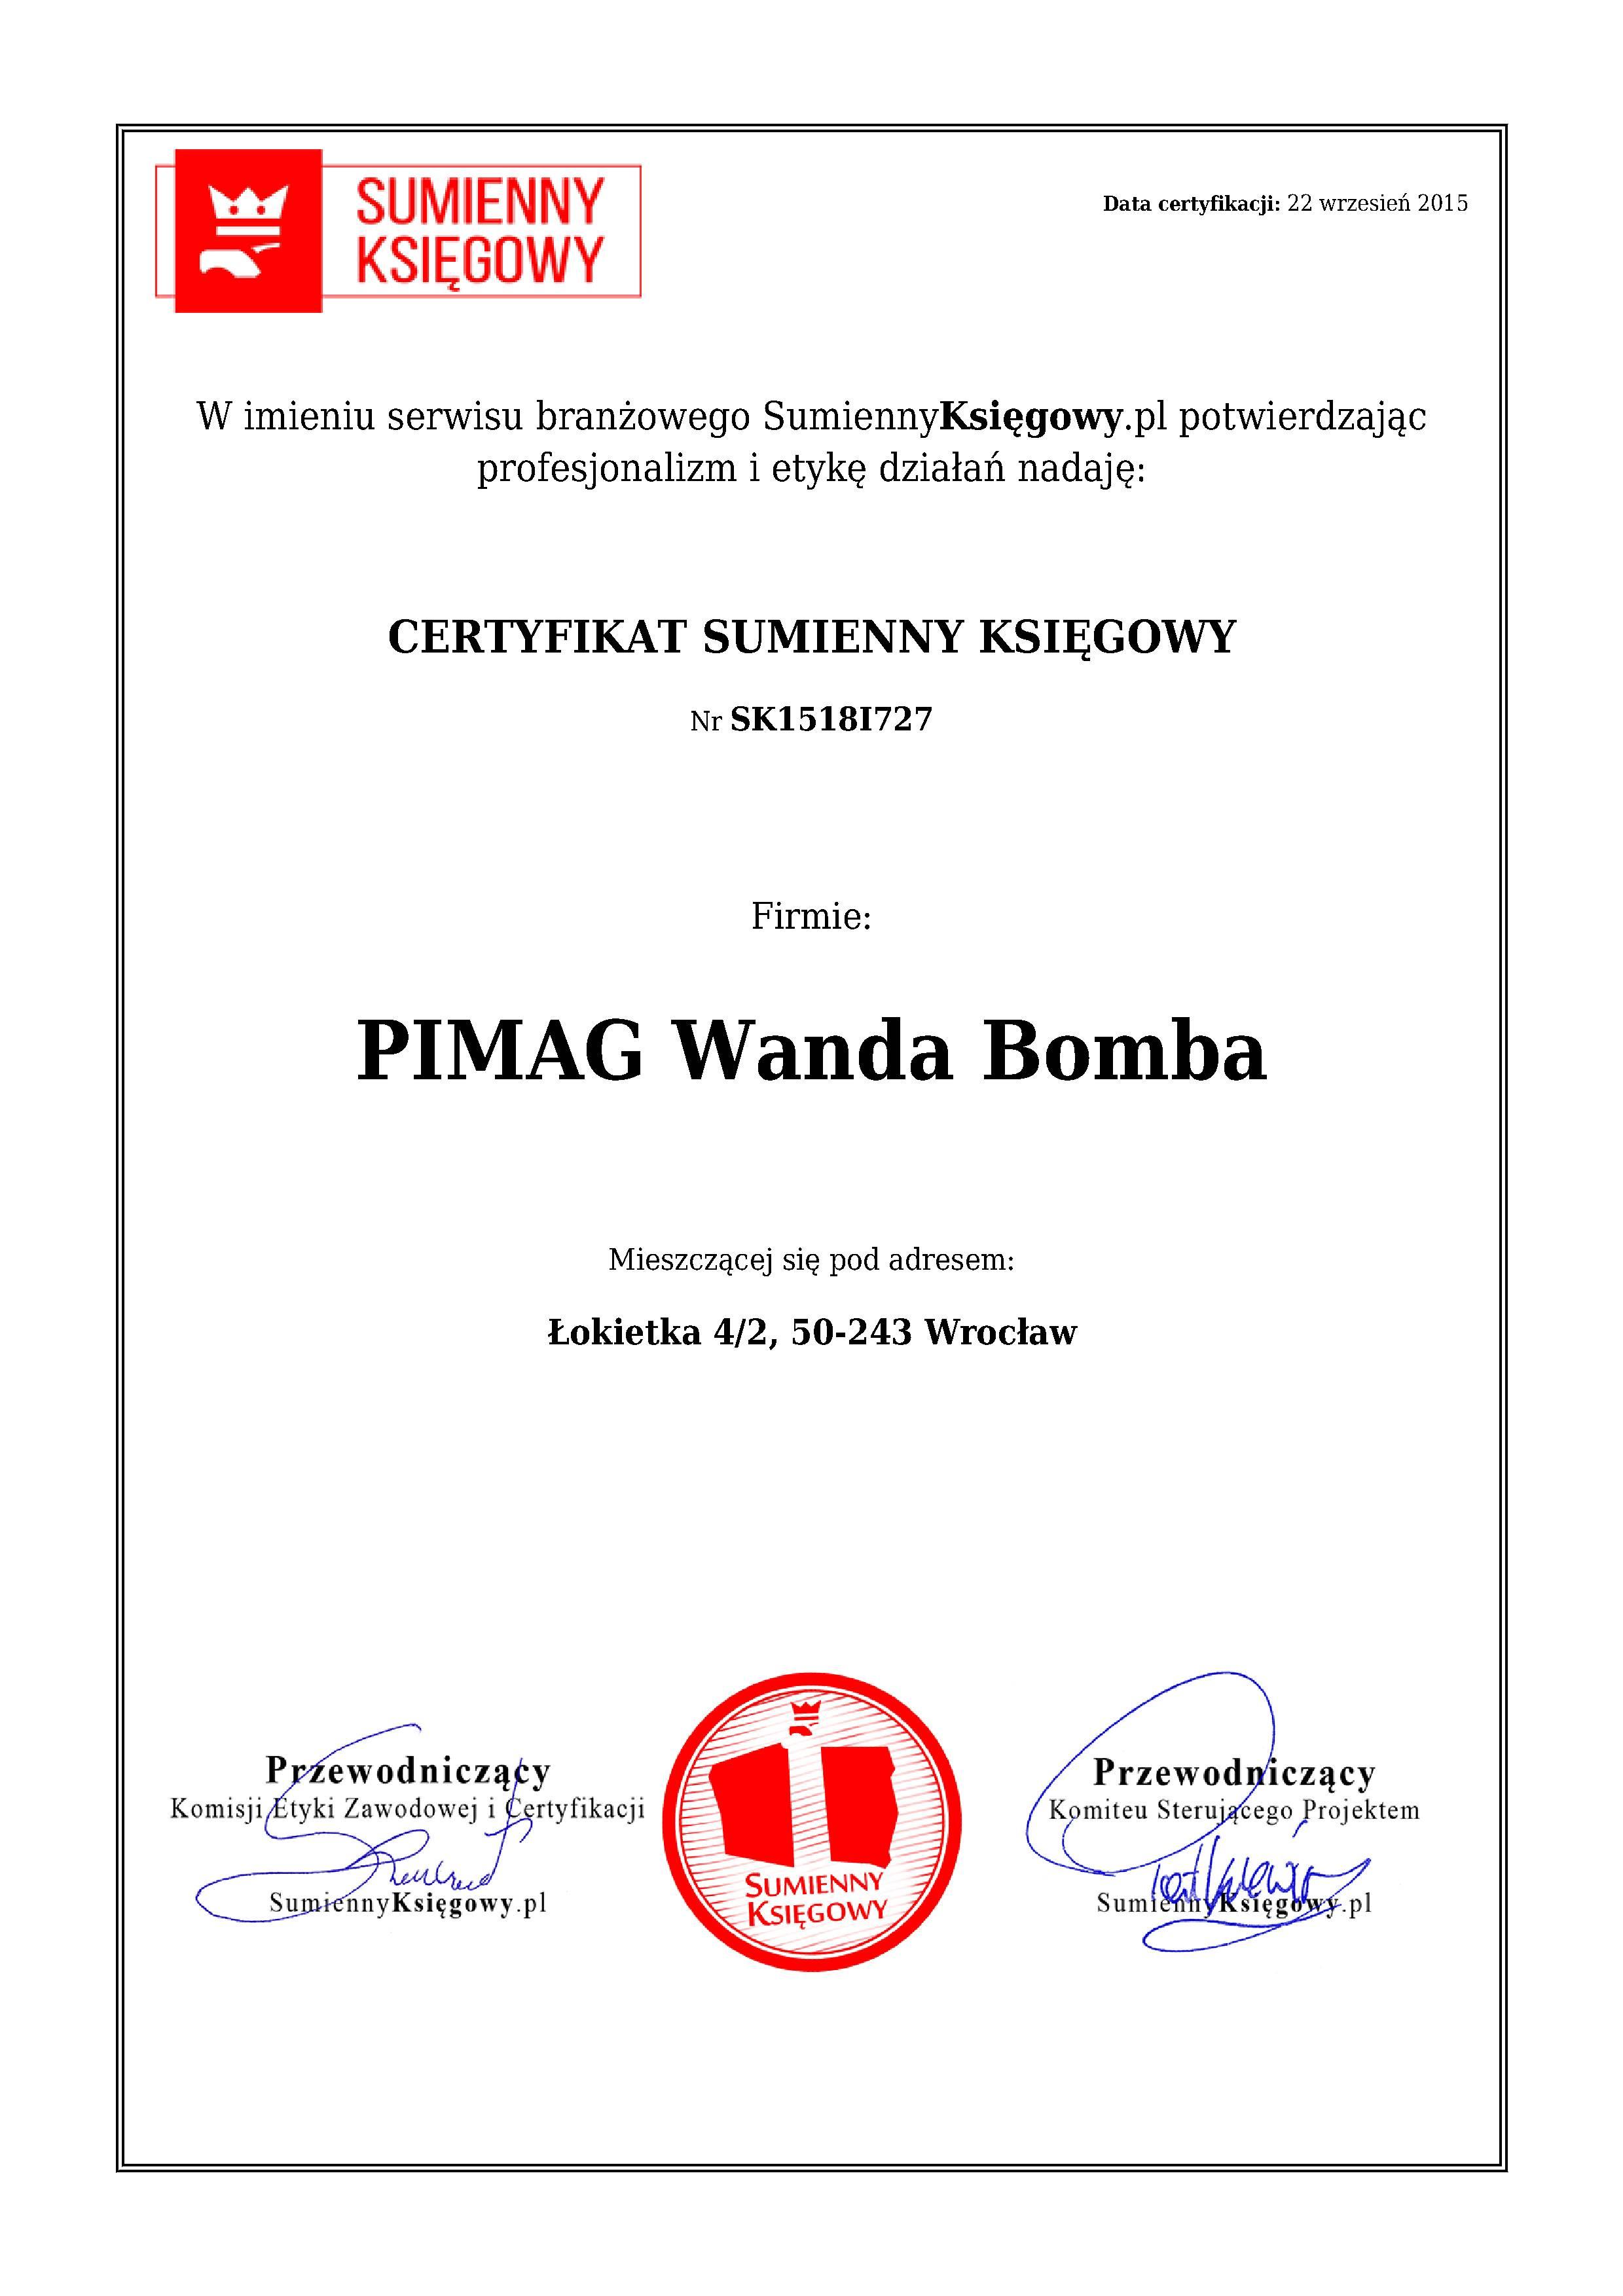 Certyfikat PIMAG Wanda Bomba